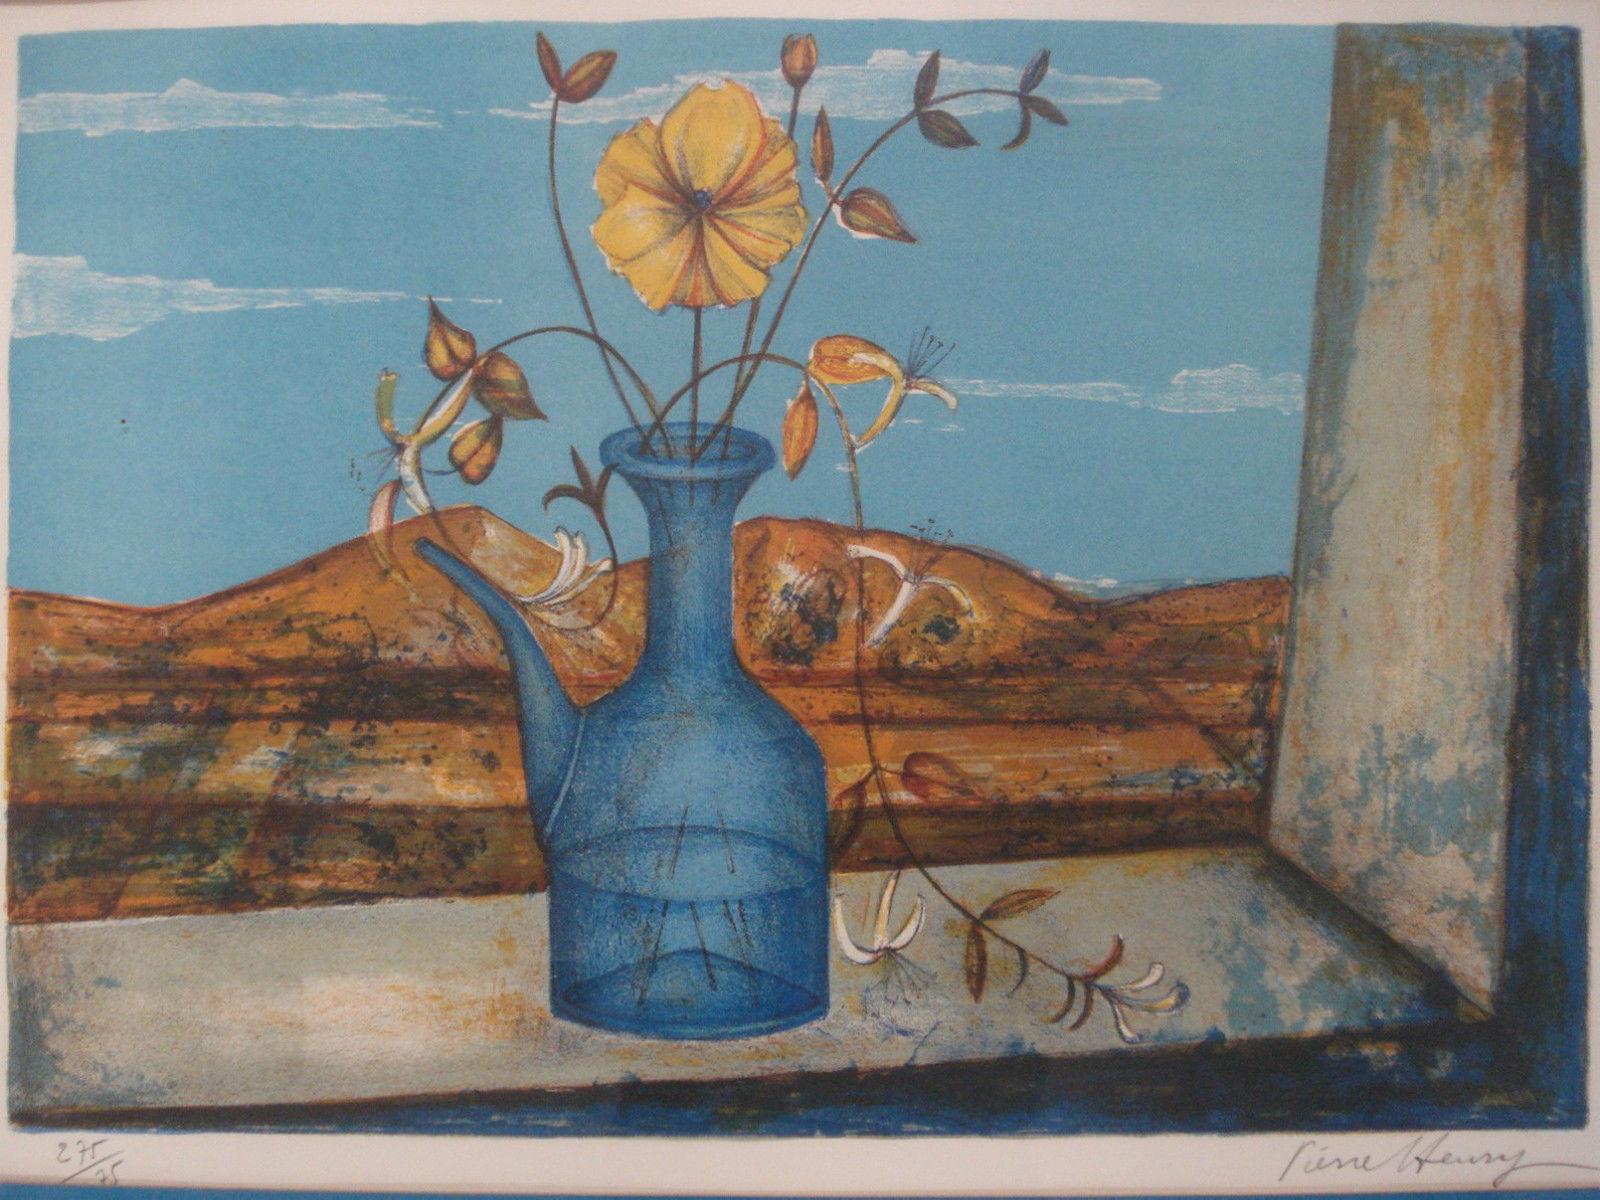 French Artist Pierre Henry Lithograph Print Pencil Sign b1931 List Ltd Ed 01326